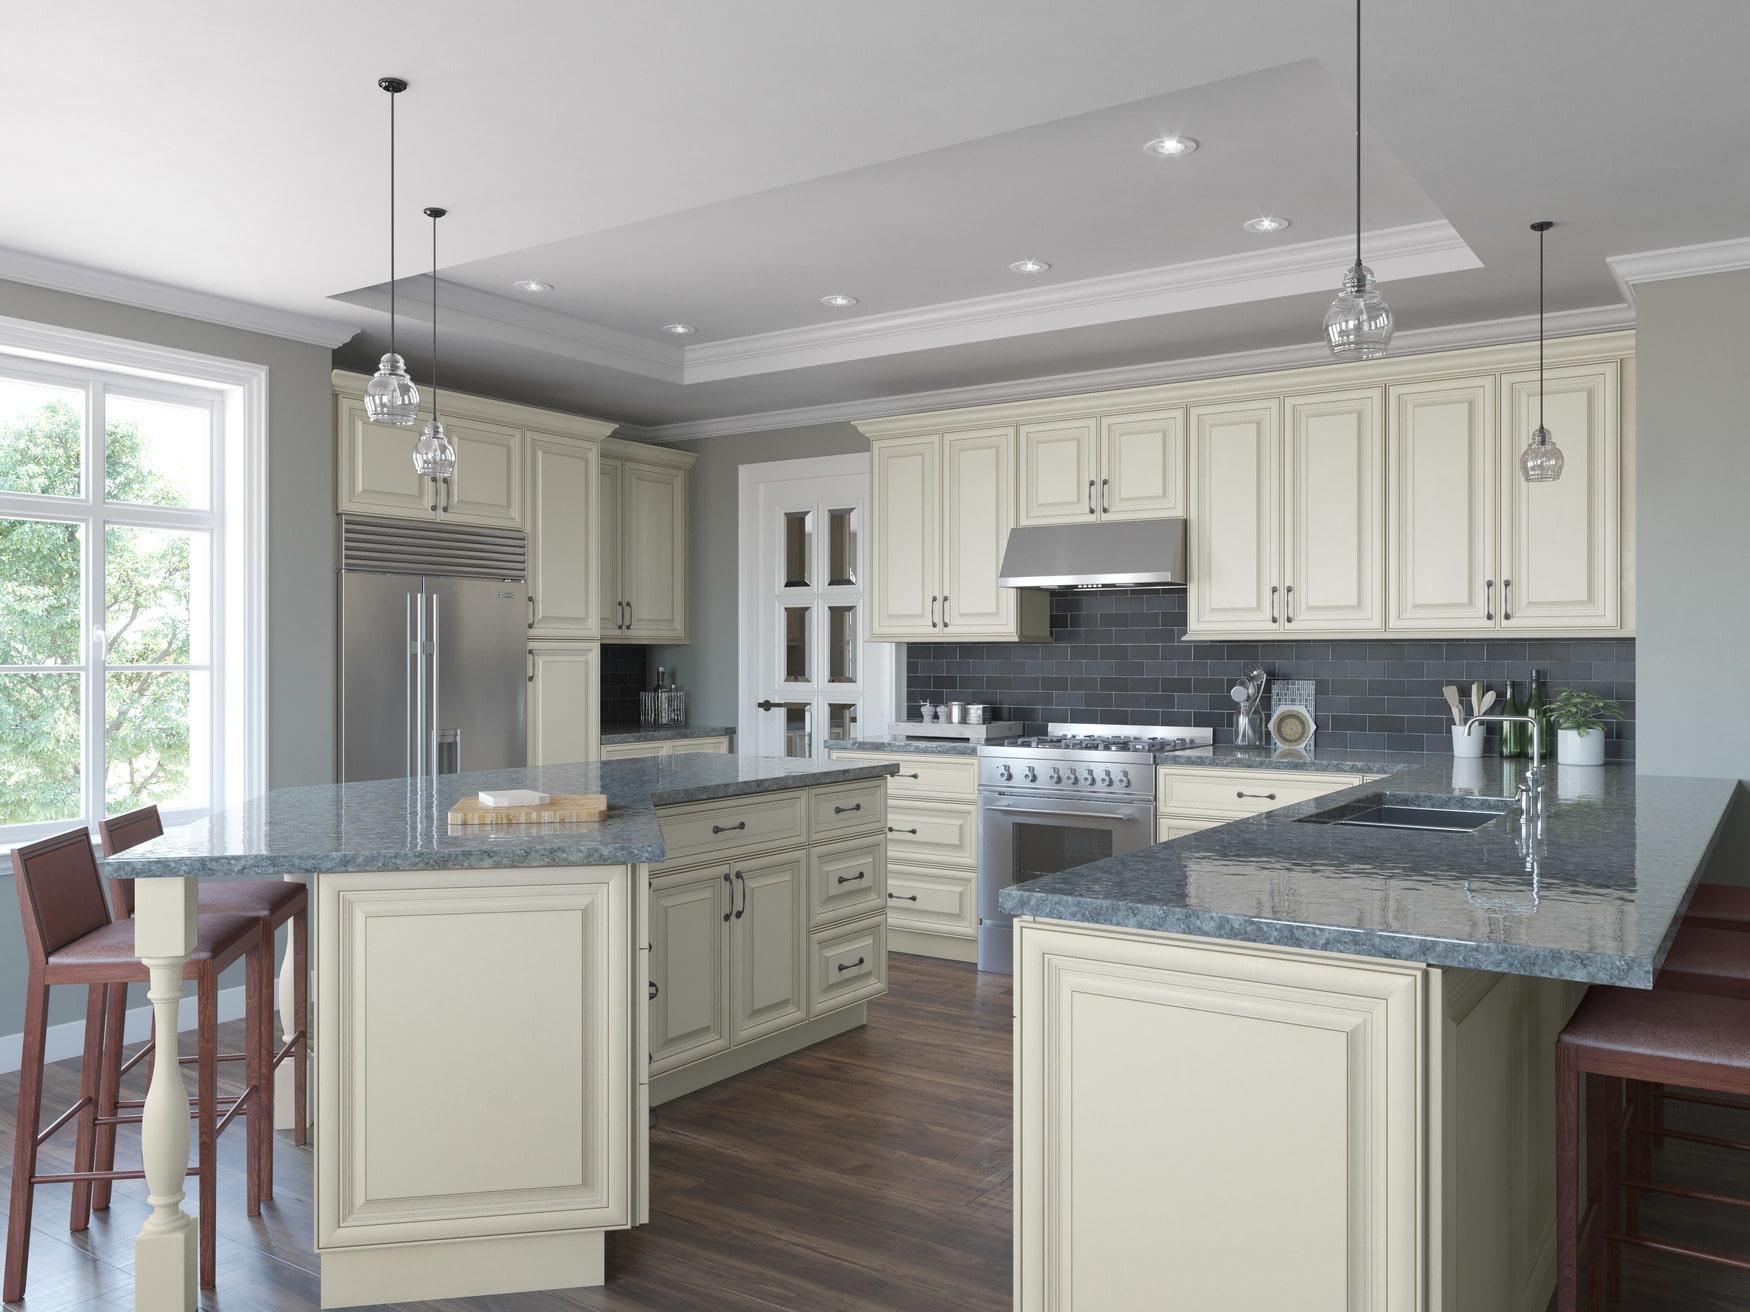 Emble Kitchen Cabinets